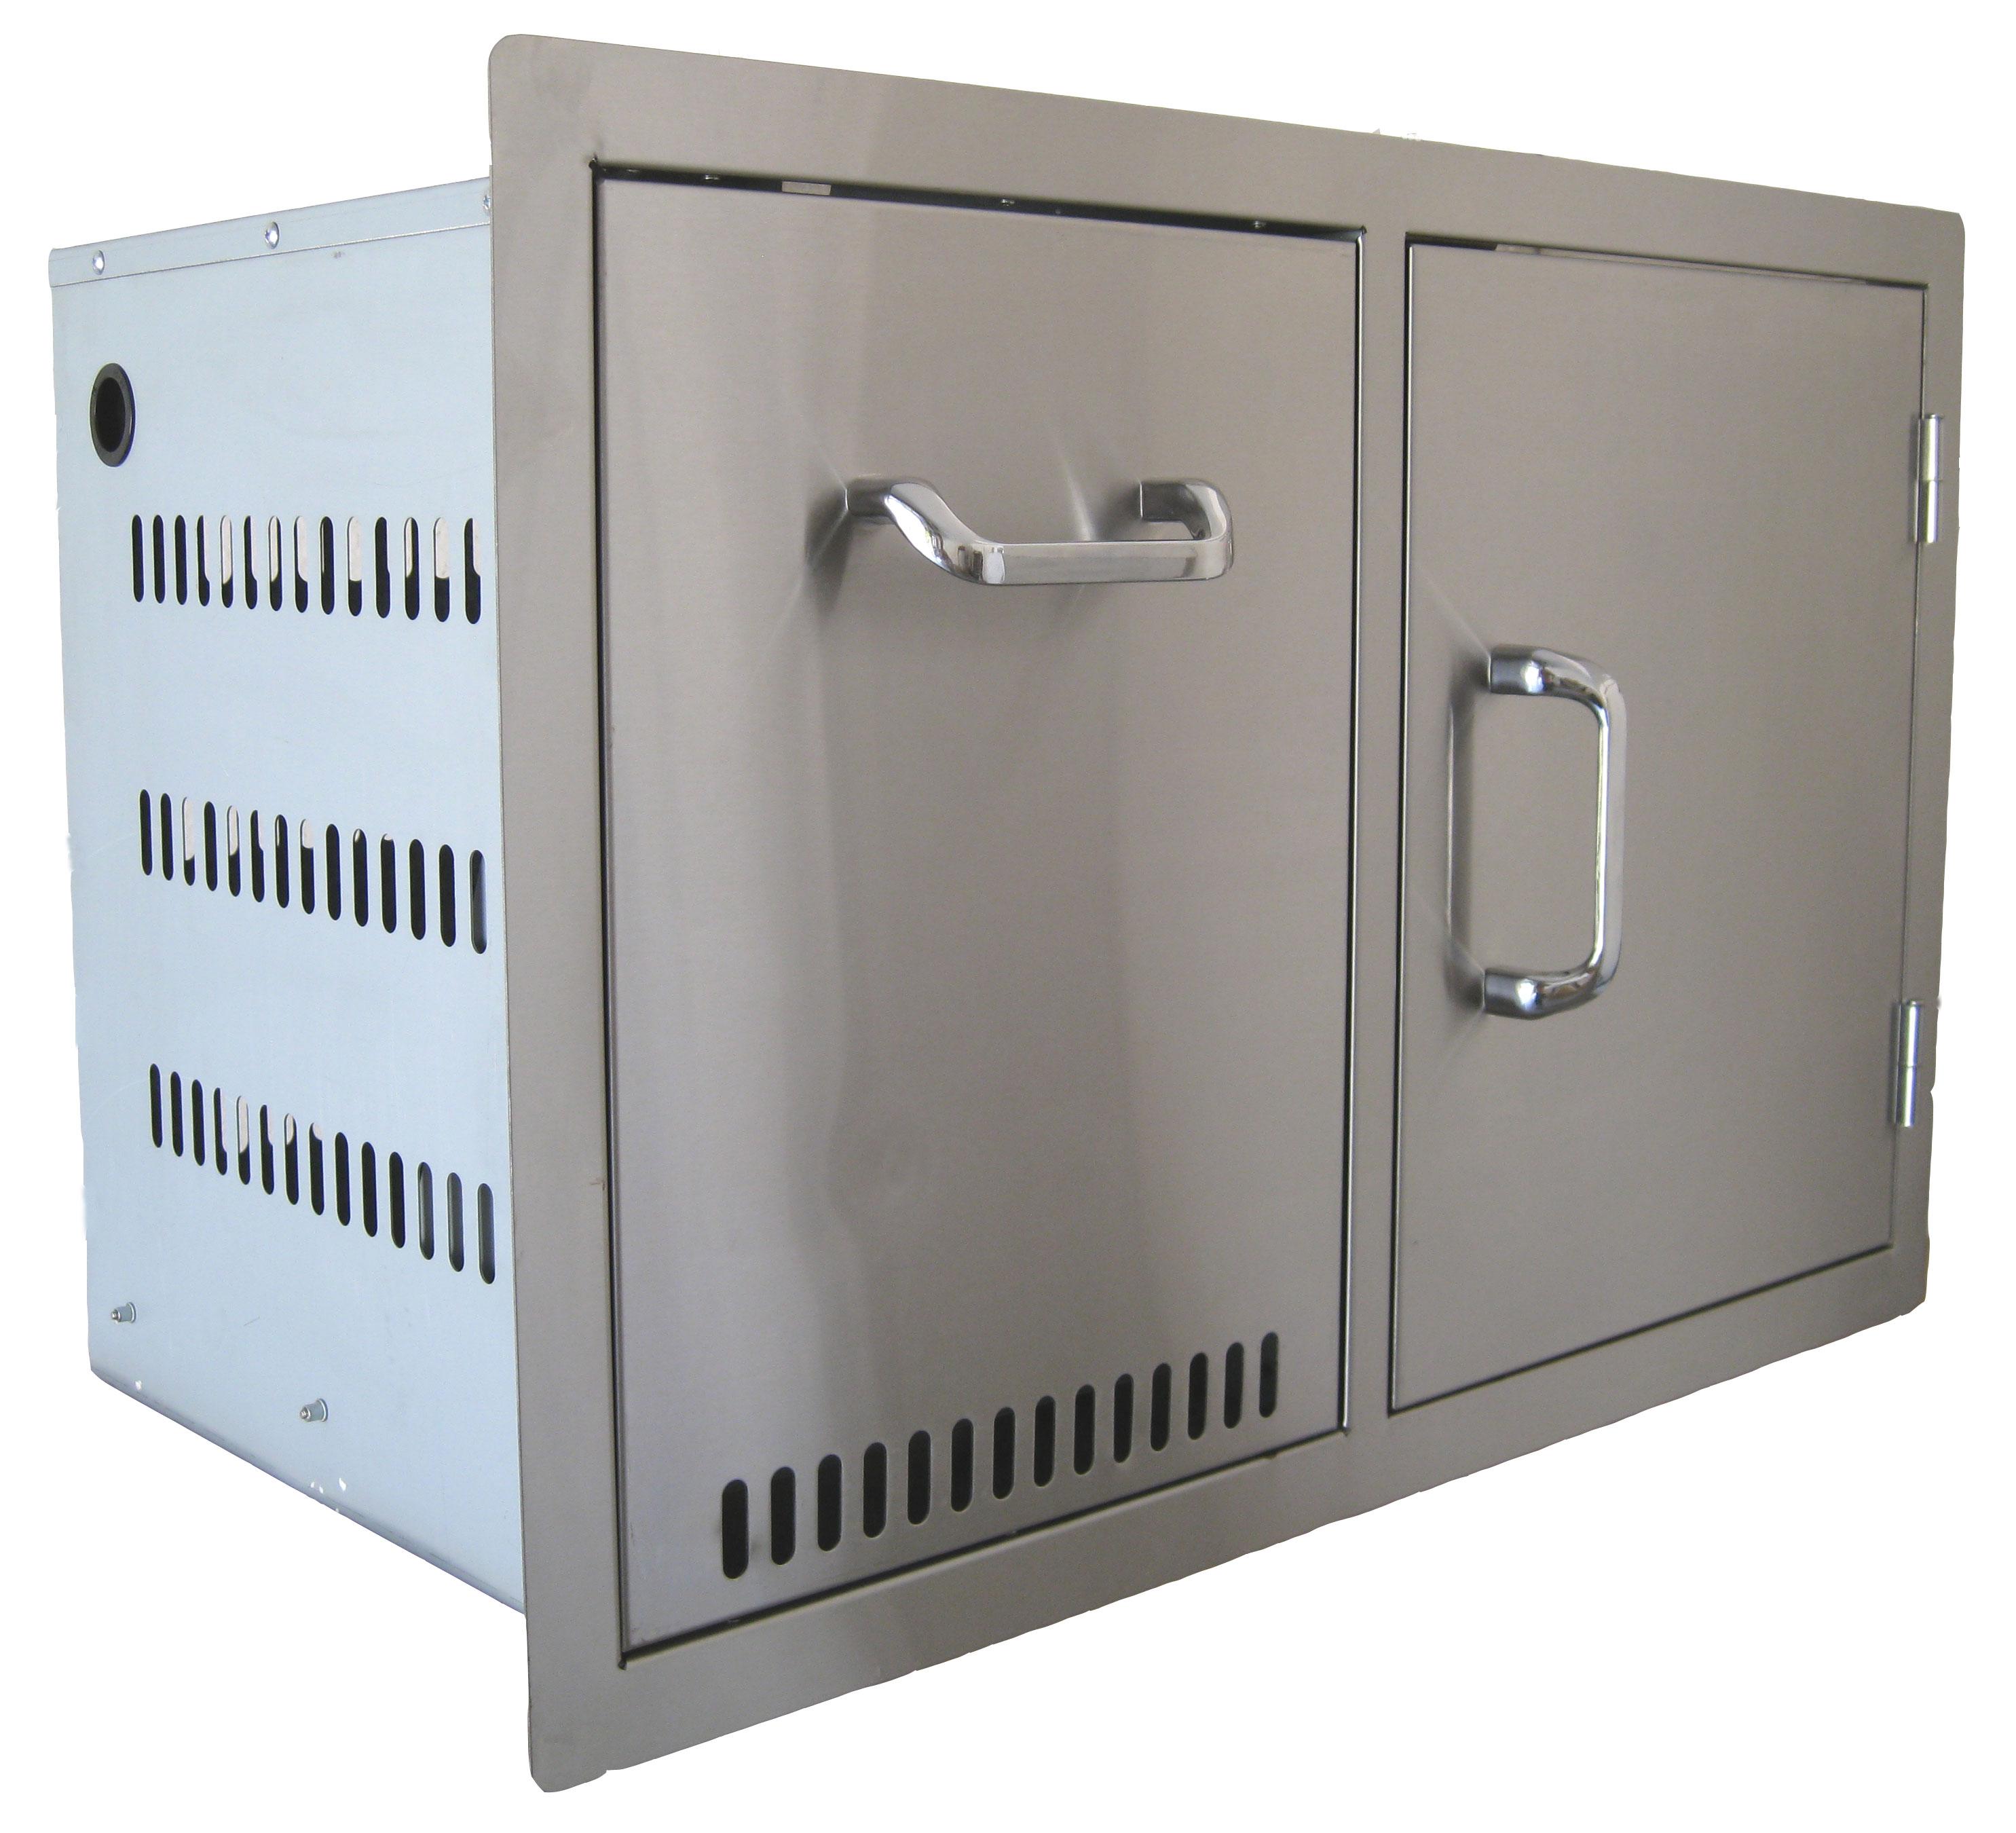 24240-stainless-steel-door-propane-drawer-combo.jpg